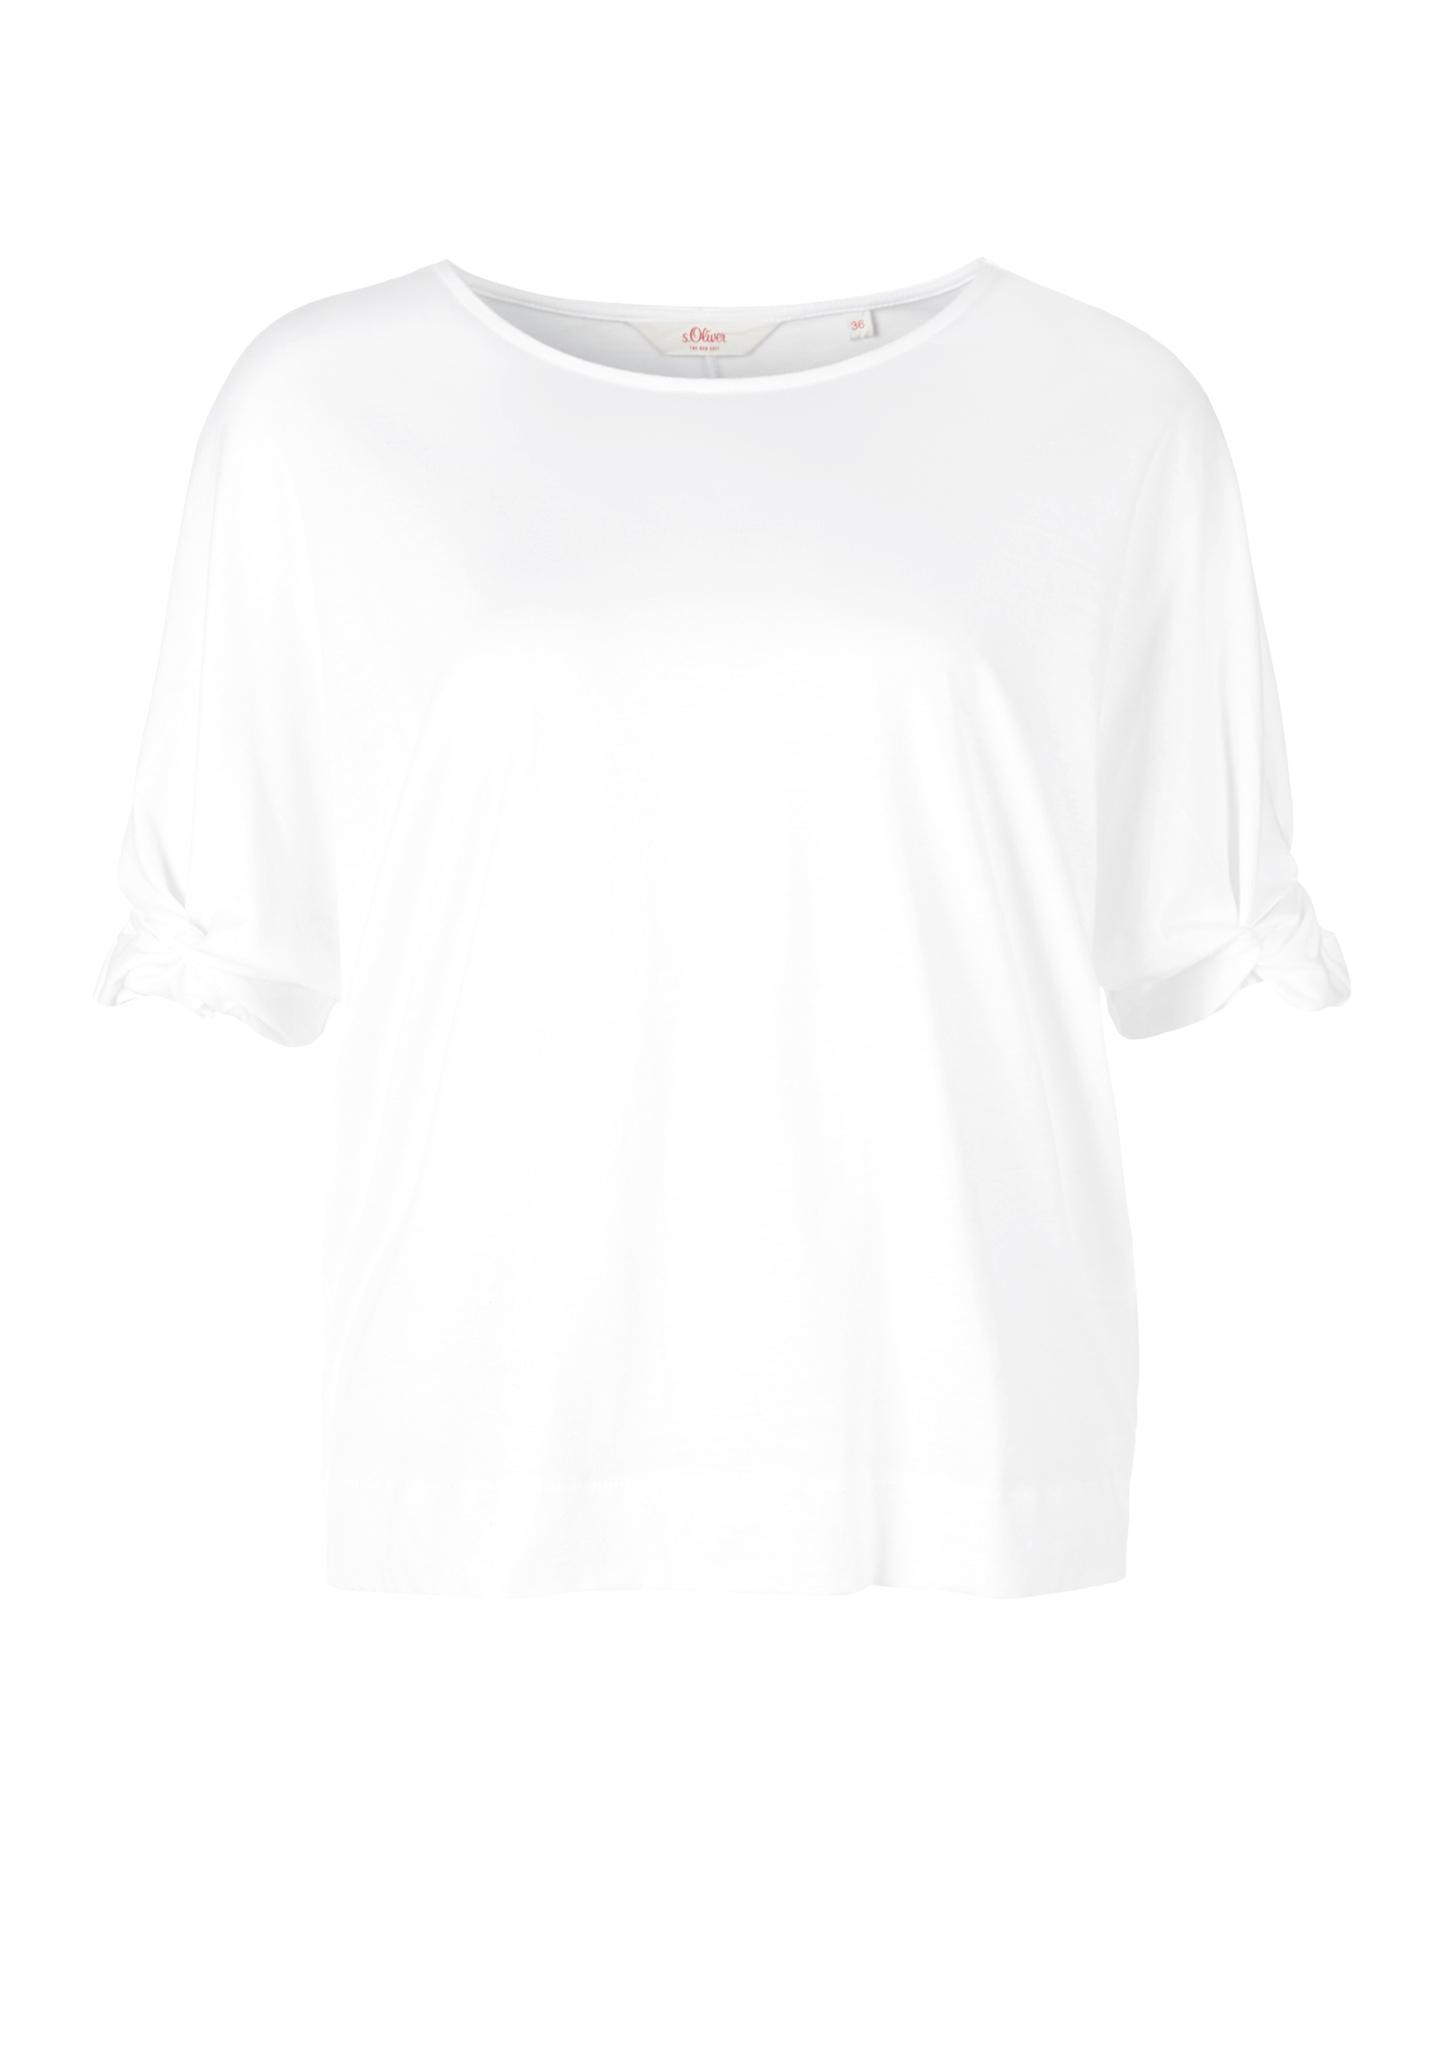 Image of Layer-Shirt